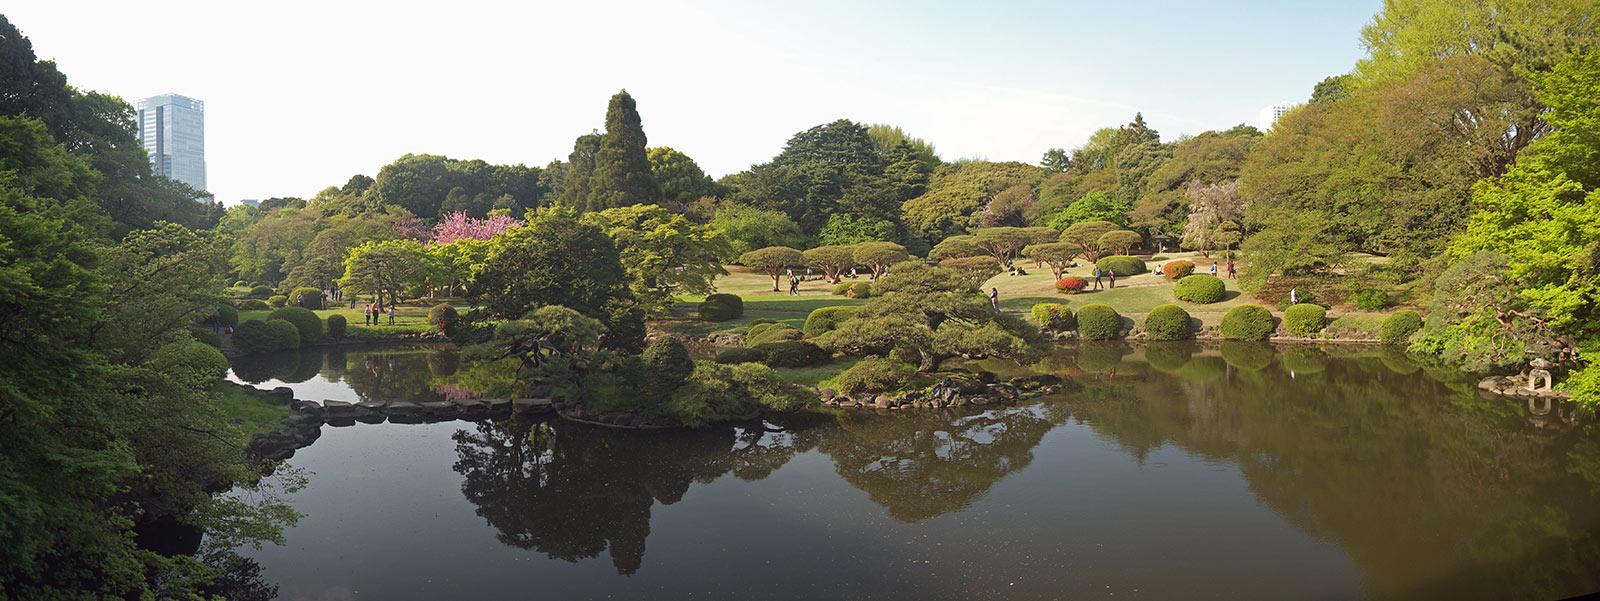 парк, япония, японский сад, Синдзюку, токио, shinjuku gyoen